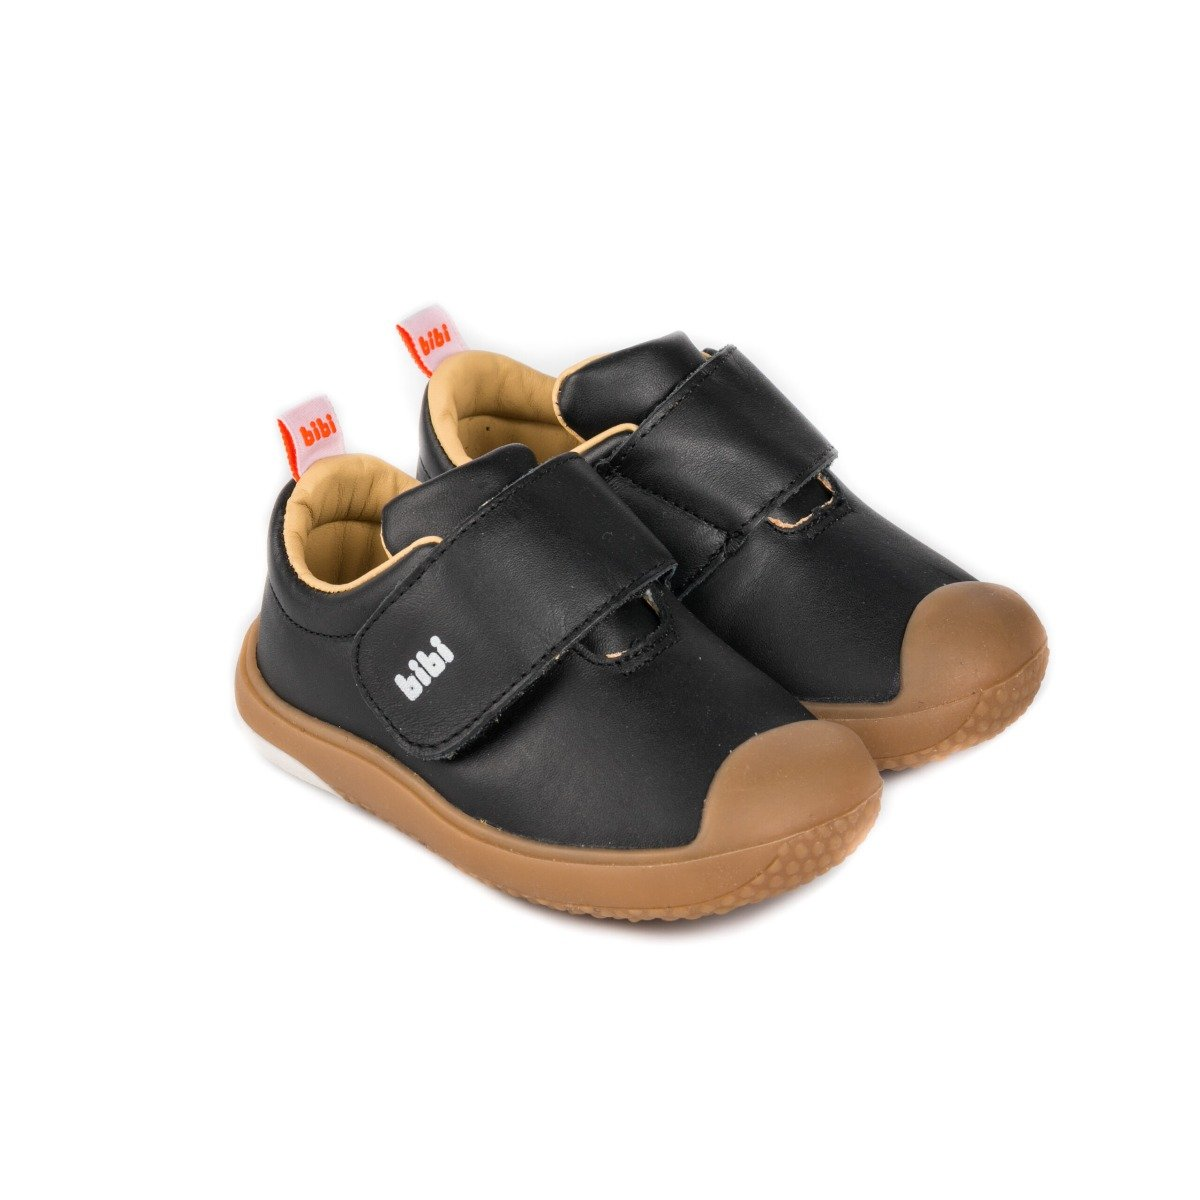 Pantofi sport Bibi Shoes Prewalker, Negru